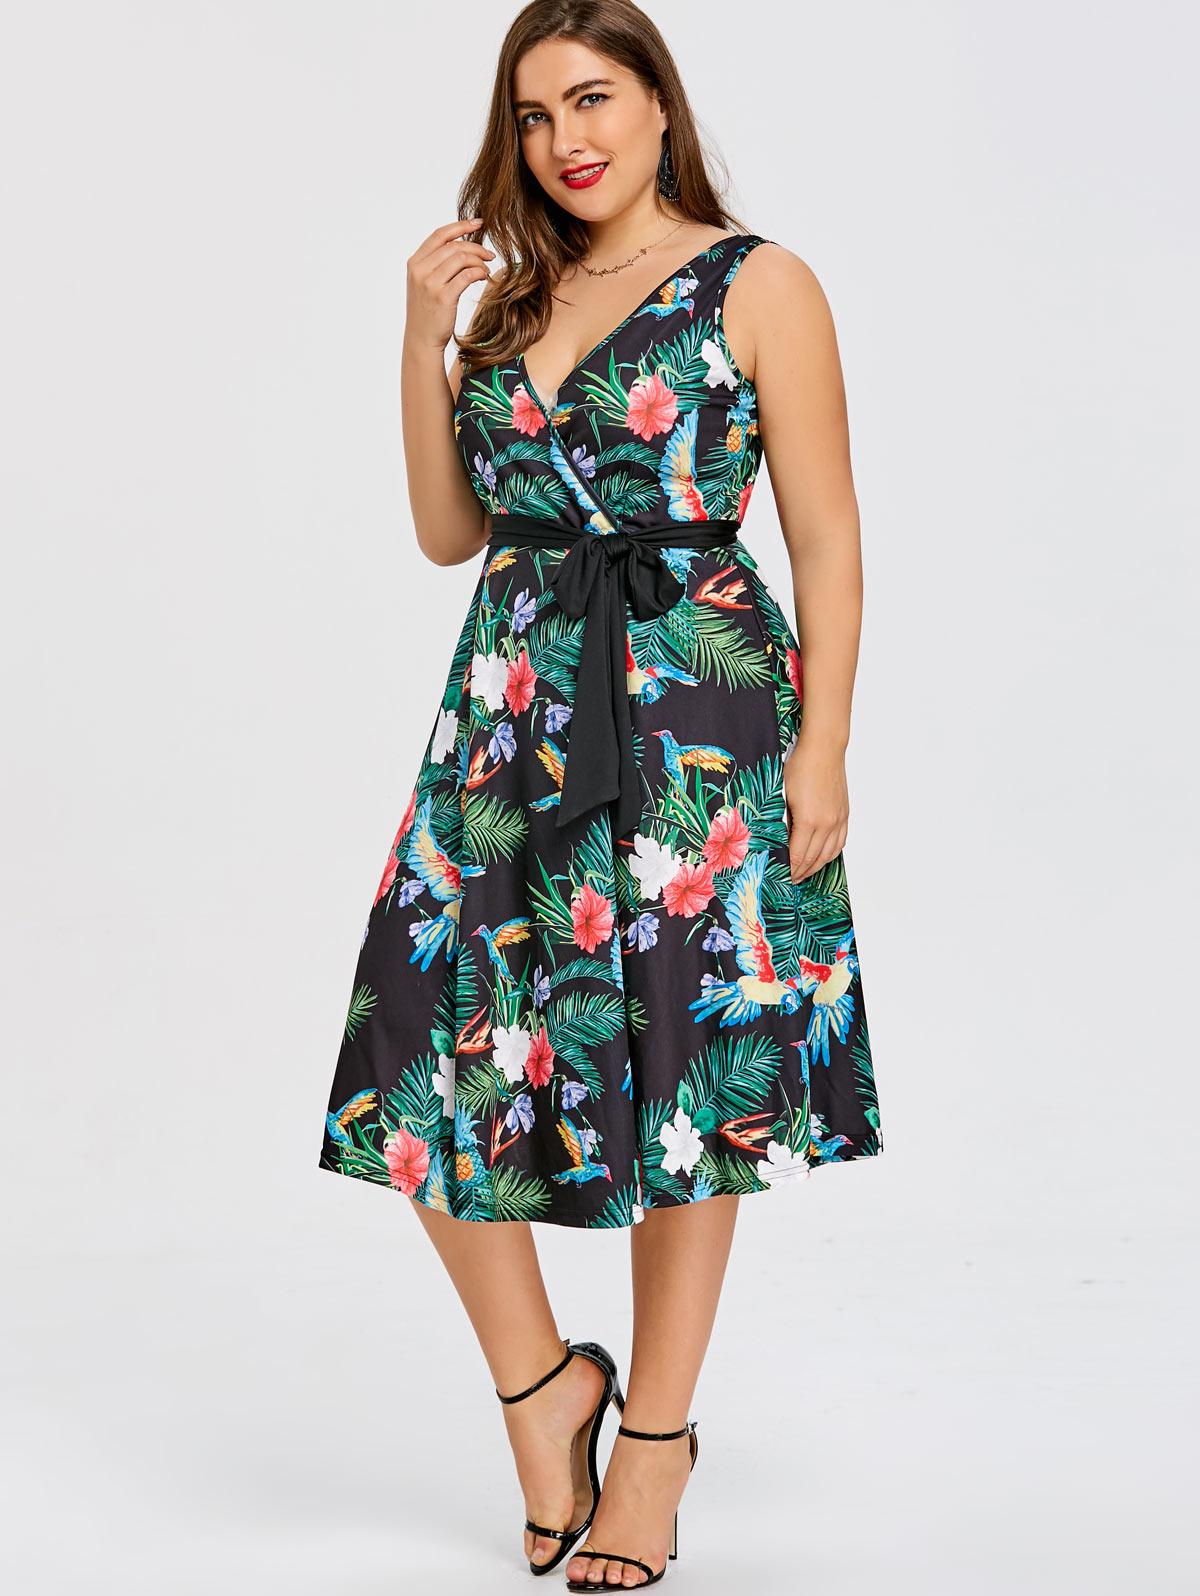 US $15.66 52% OFF|Wipalo Plus Size Hawaiian Leaf Midi Boho Dress Women  Sleeveless V Neck Belted Elegant Party Vintage Dresses Robe Vestido 5XL-in  ...